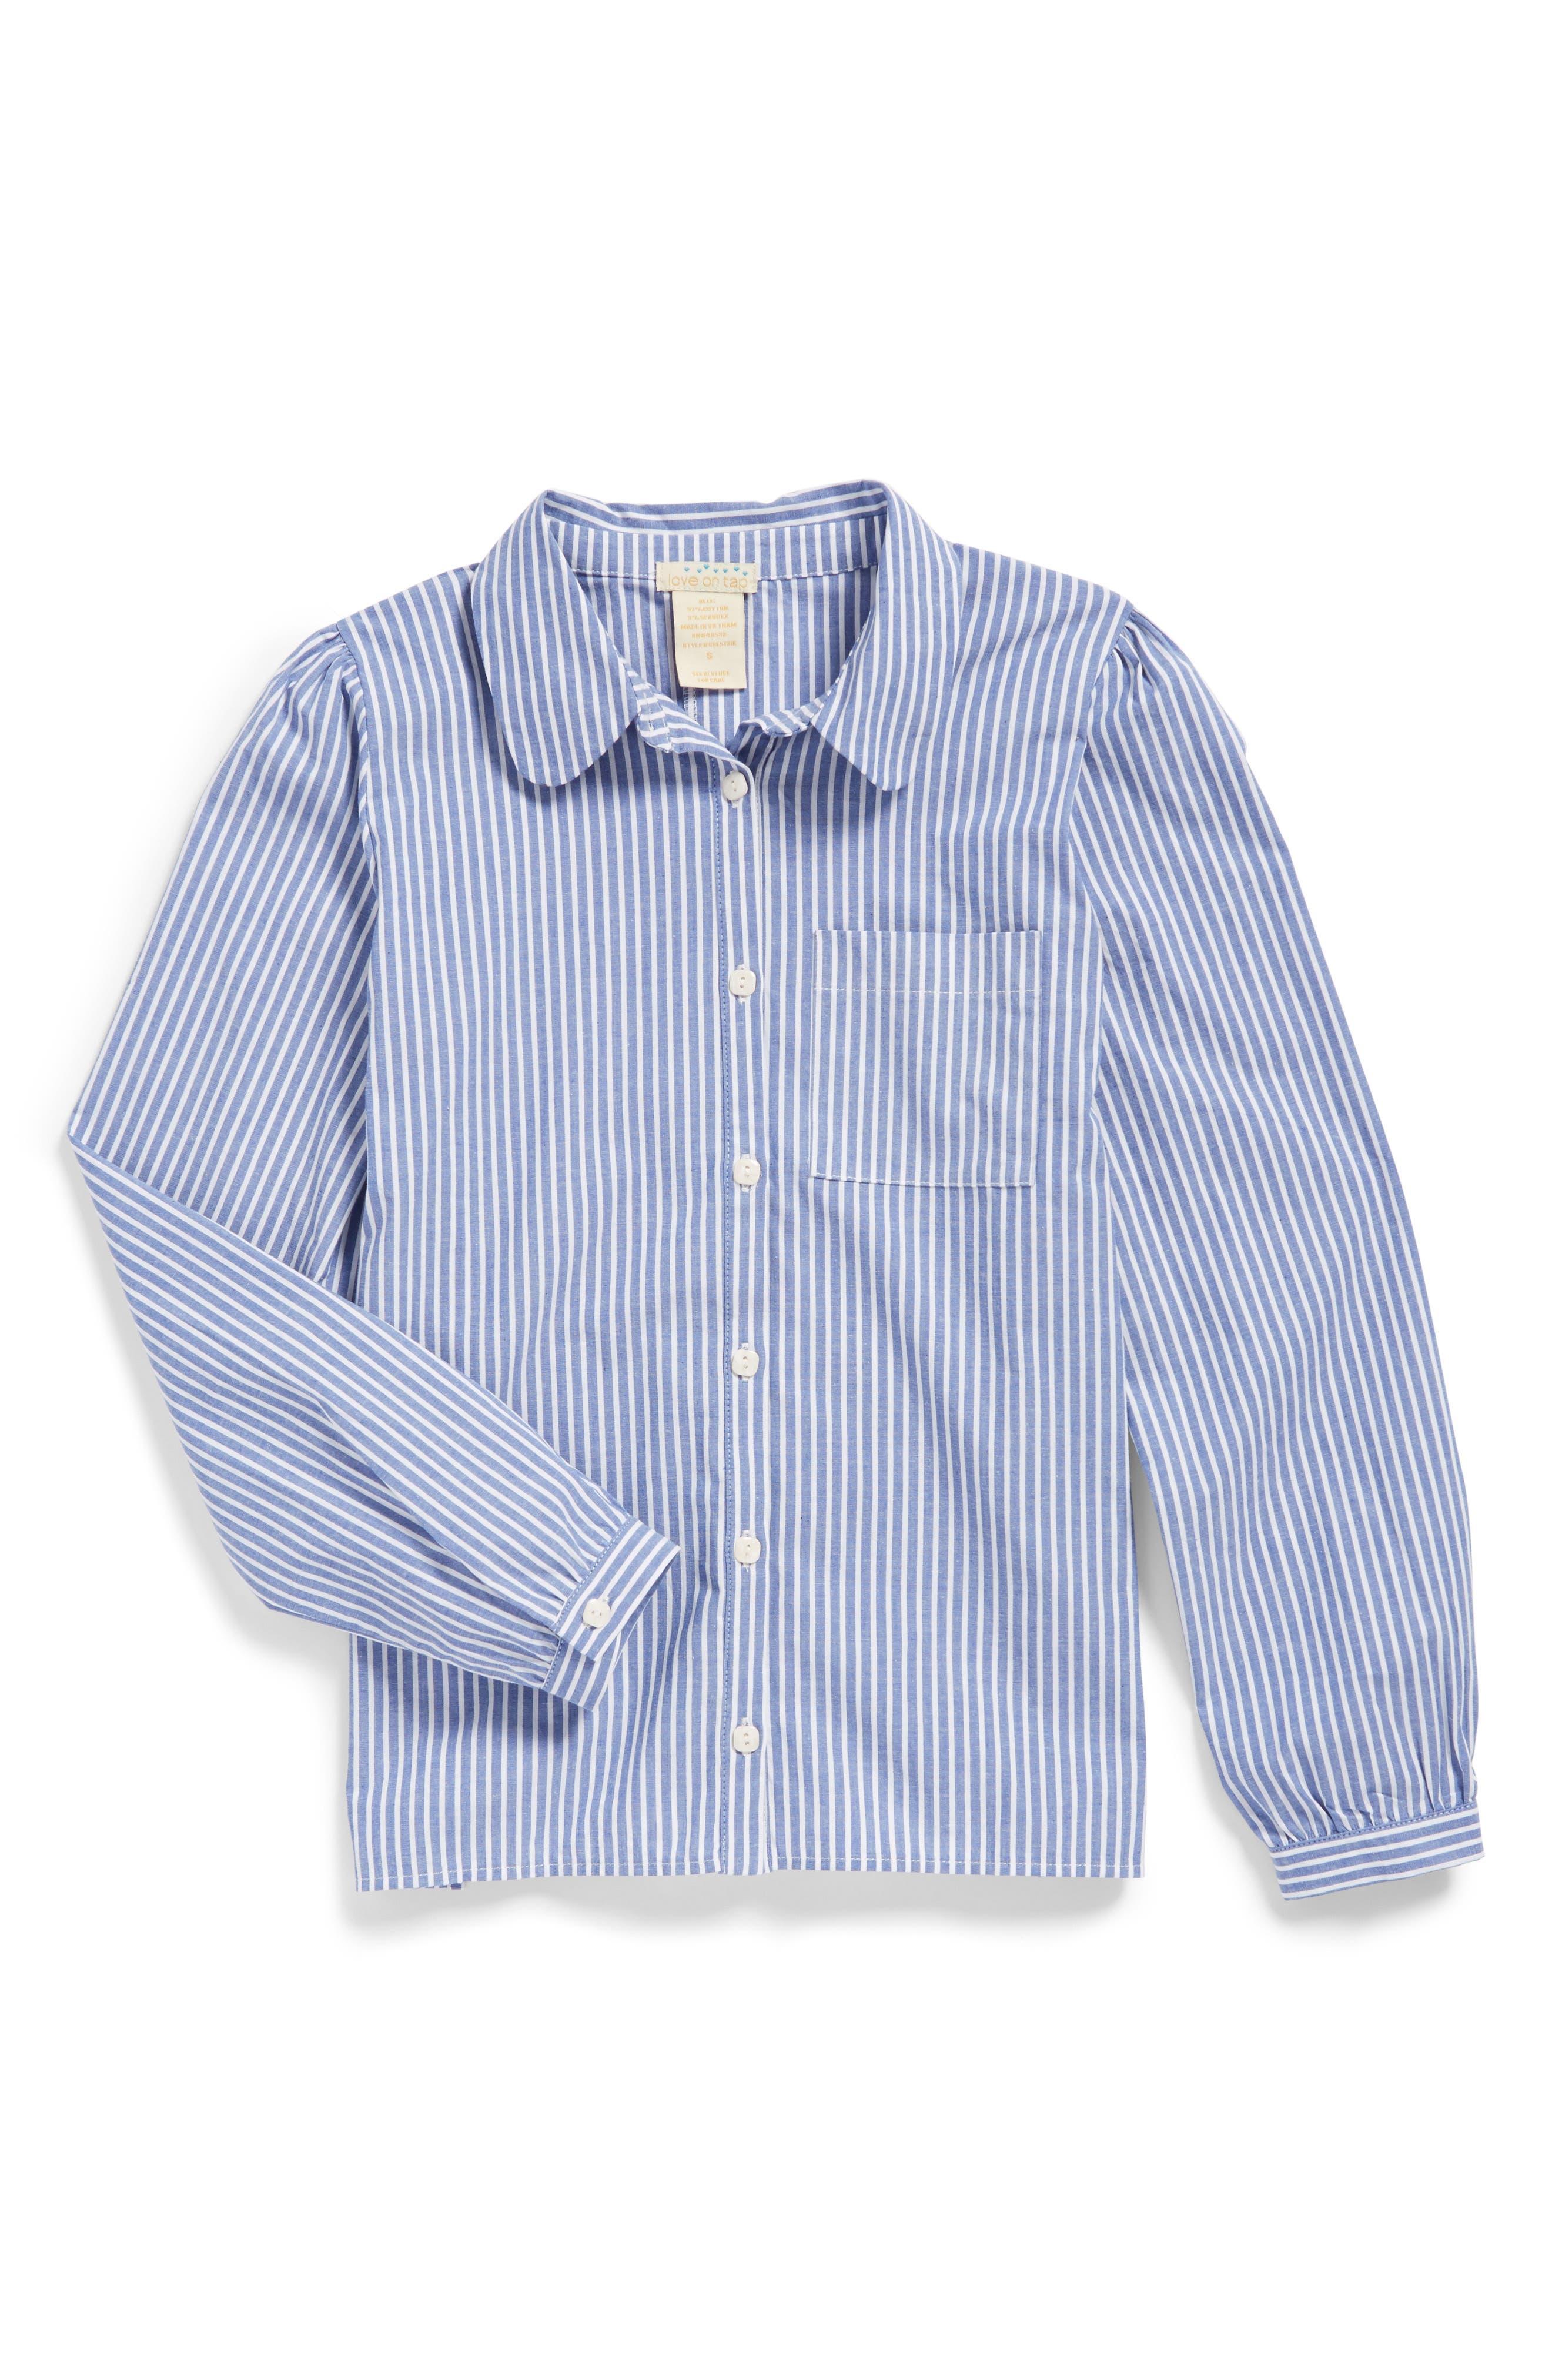 Main Image - Love On Tap Stripe Stretch Cotton Shirt (Big Girls)